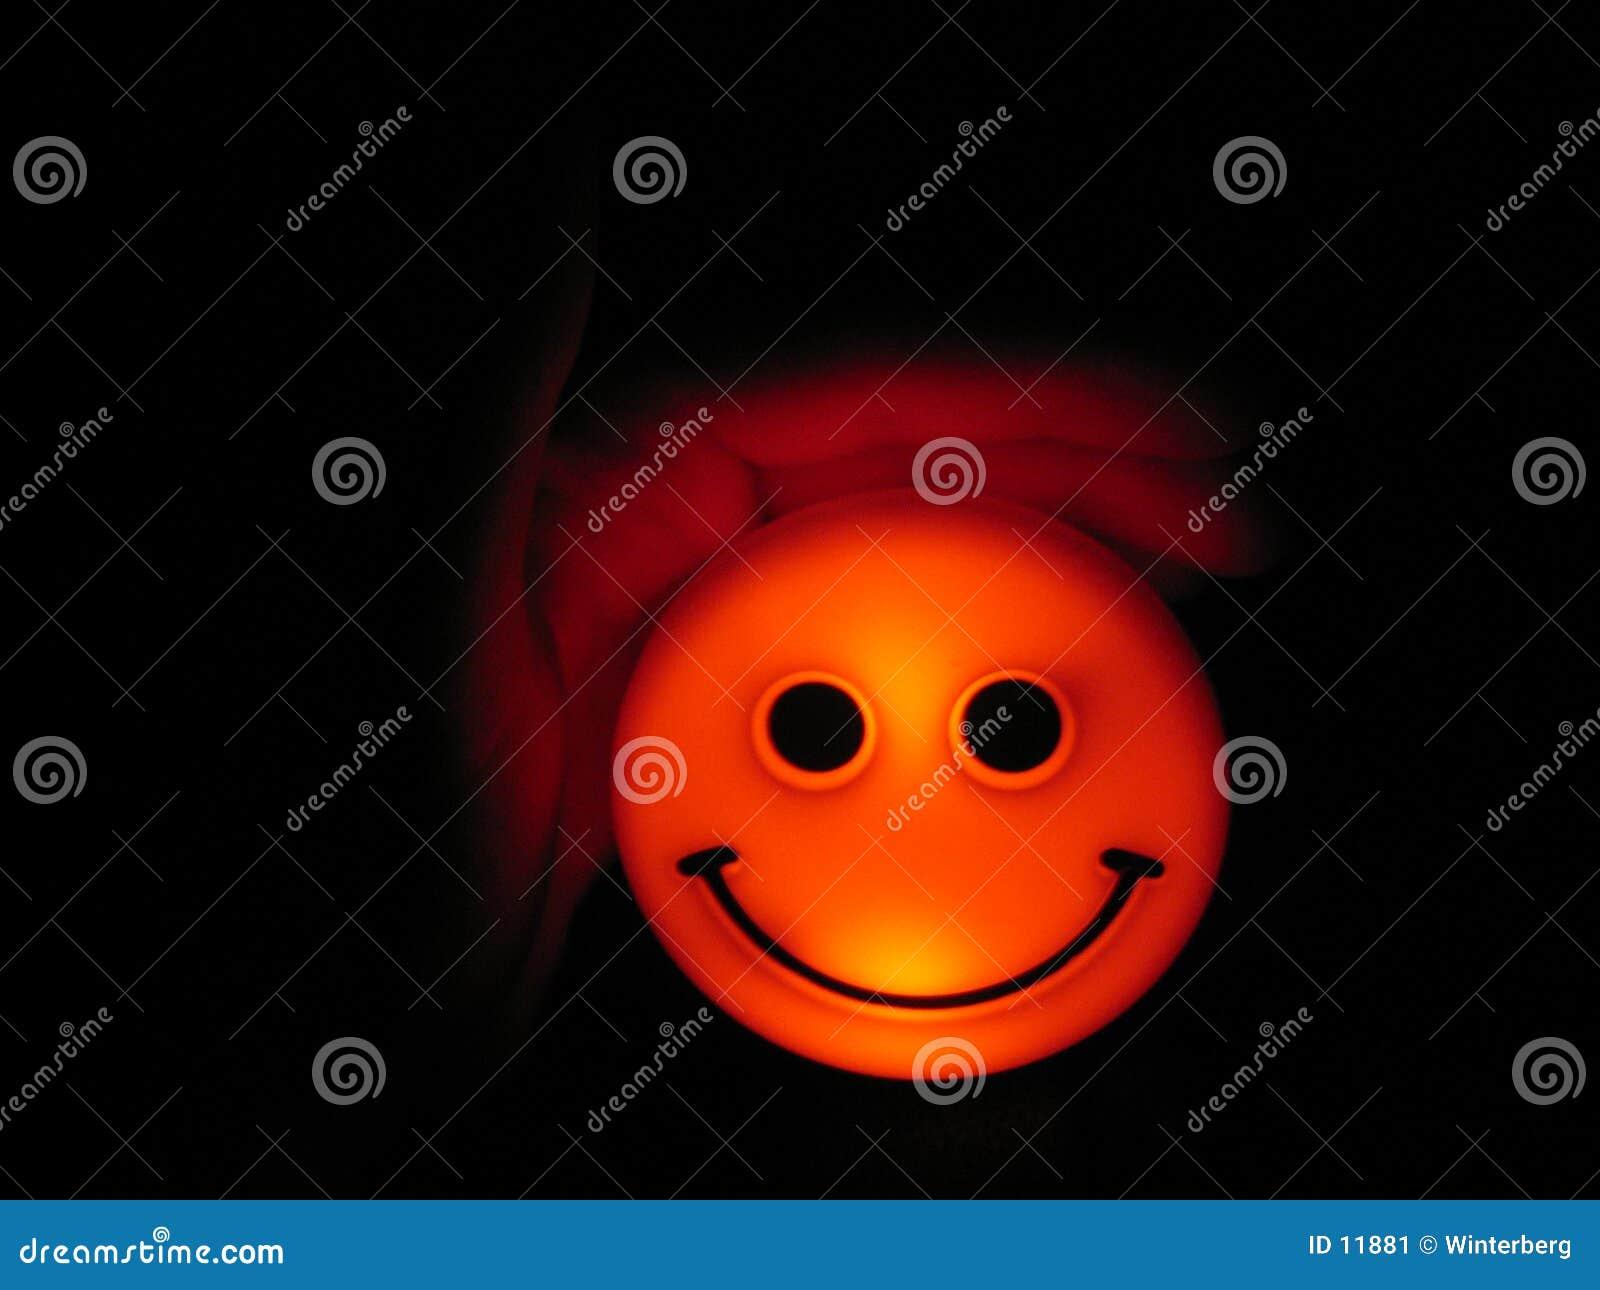 Beherborgener smiley